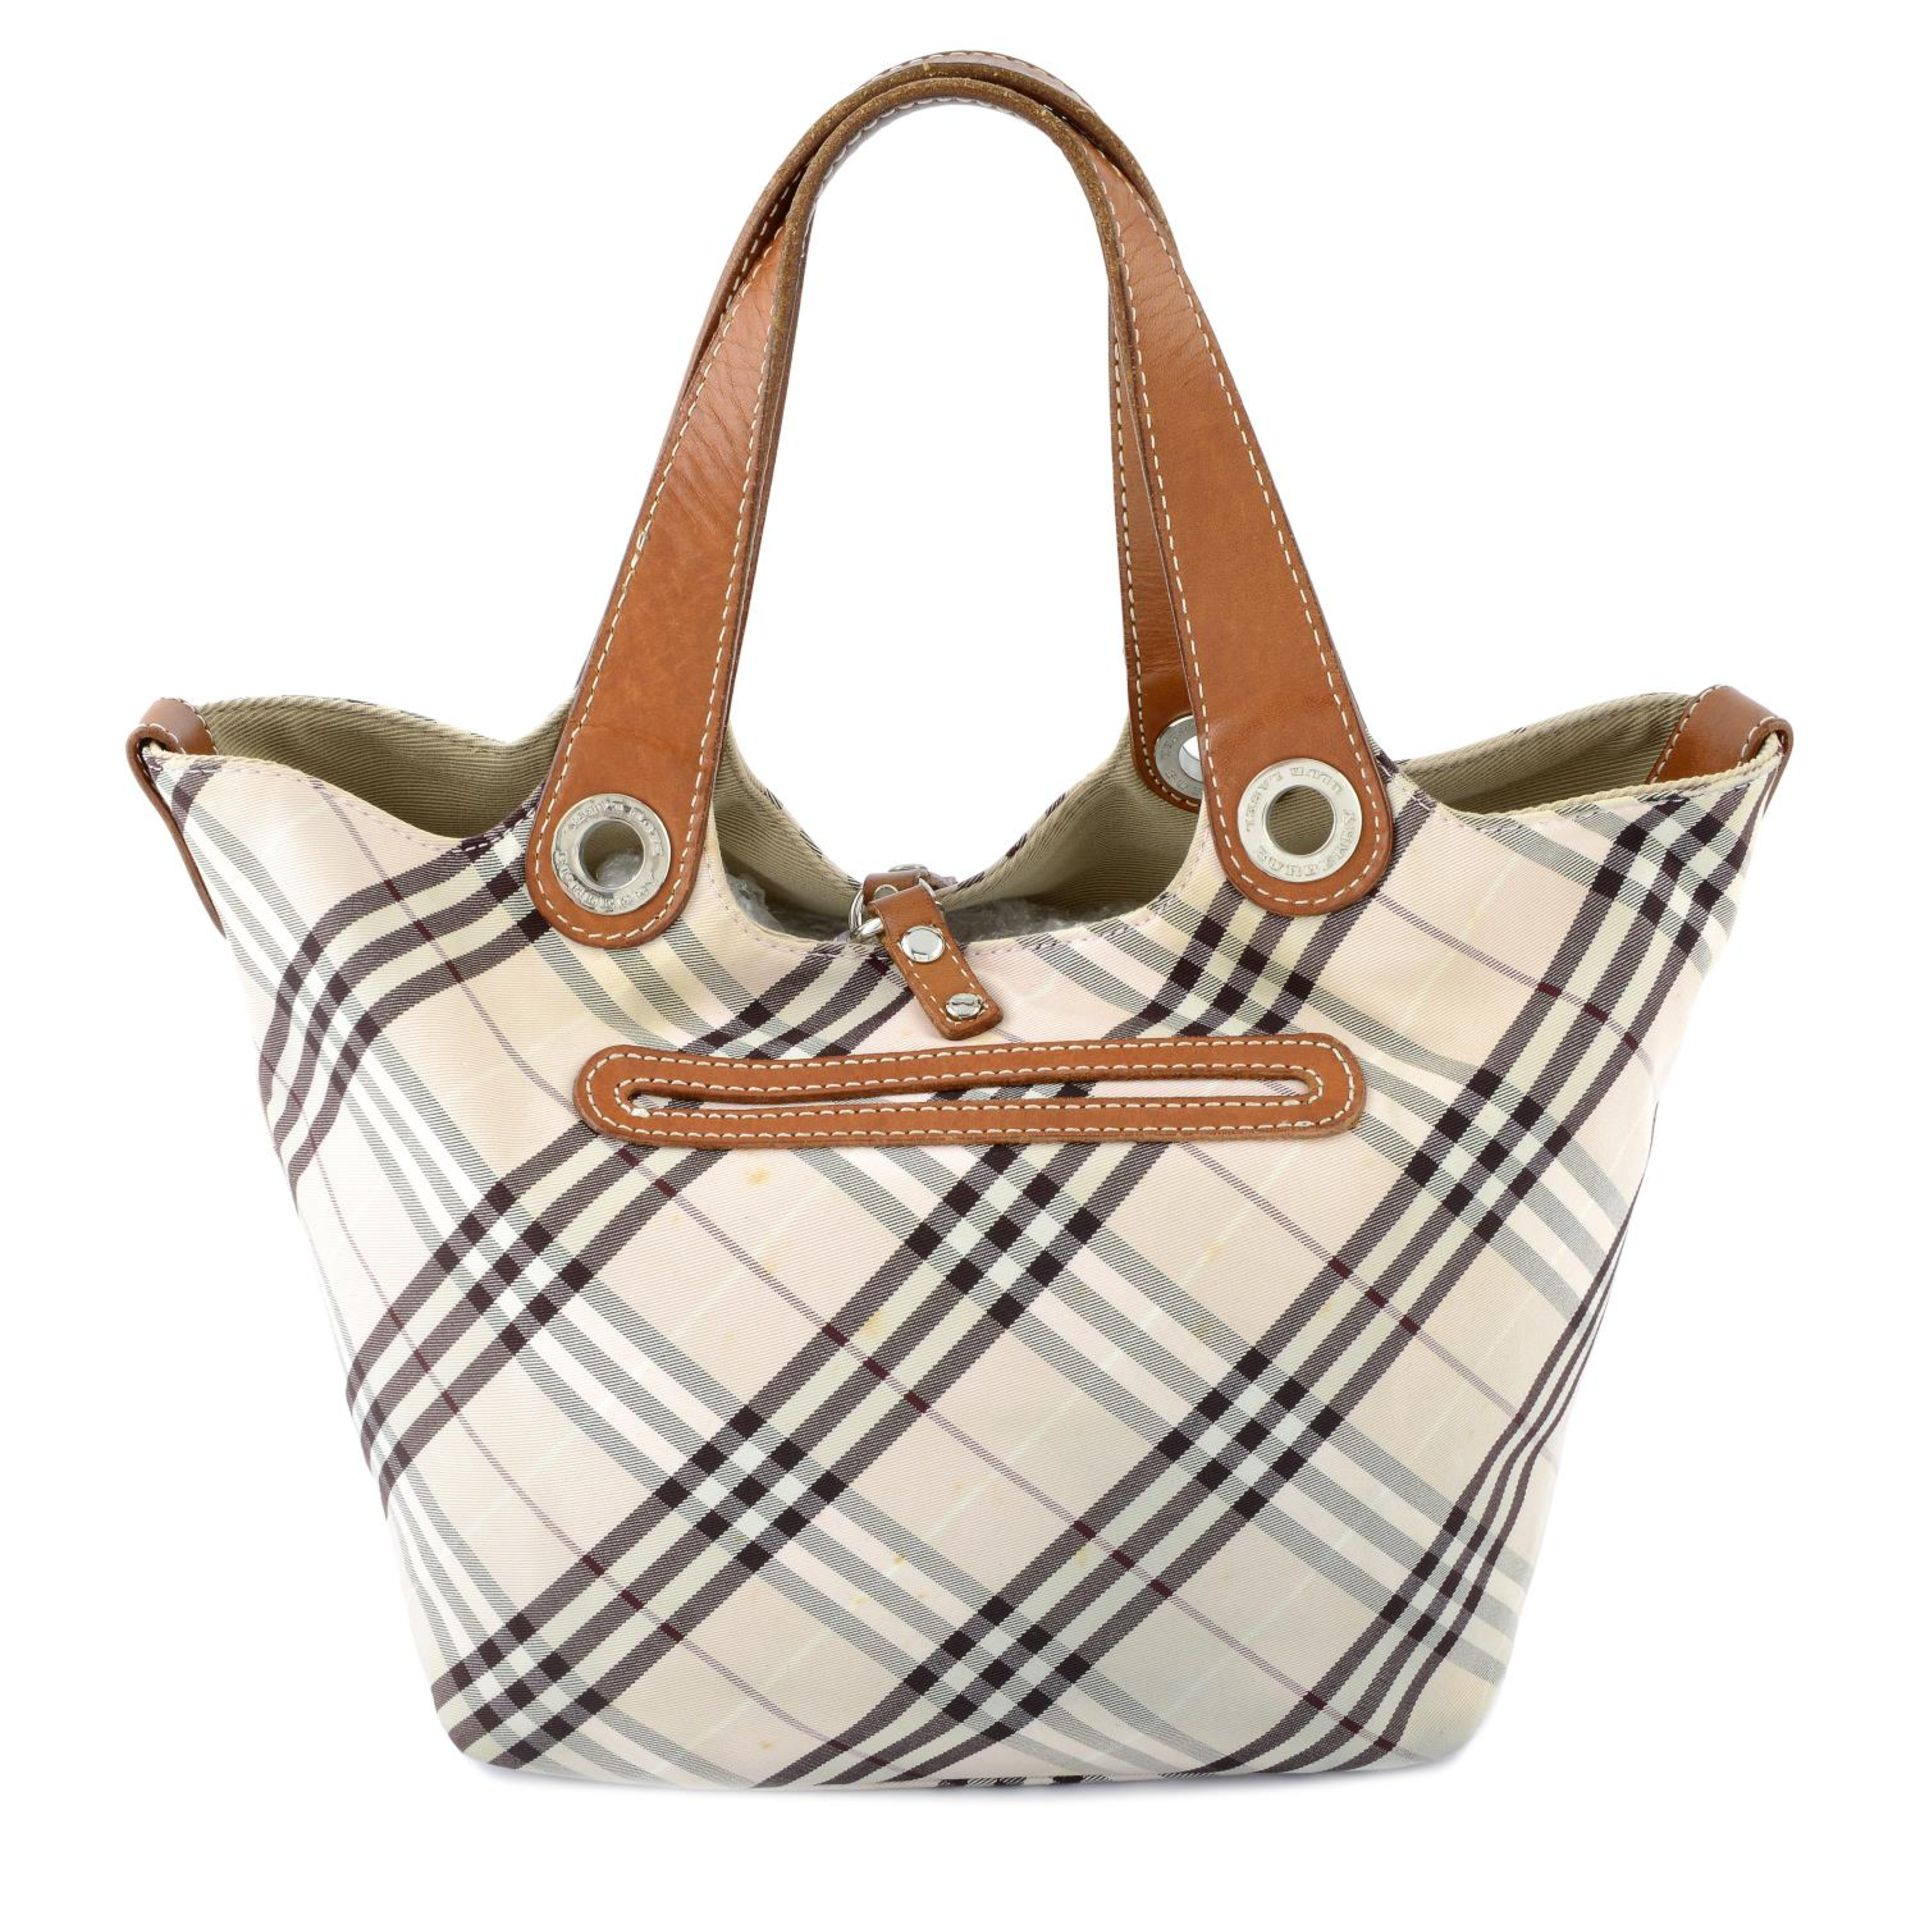 BURBERRY - a Blue Label reversible handbag. - Image 2 of 5